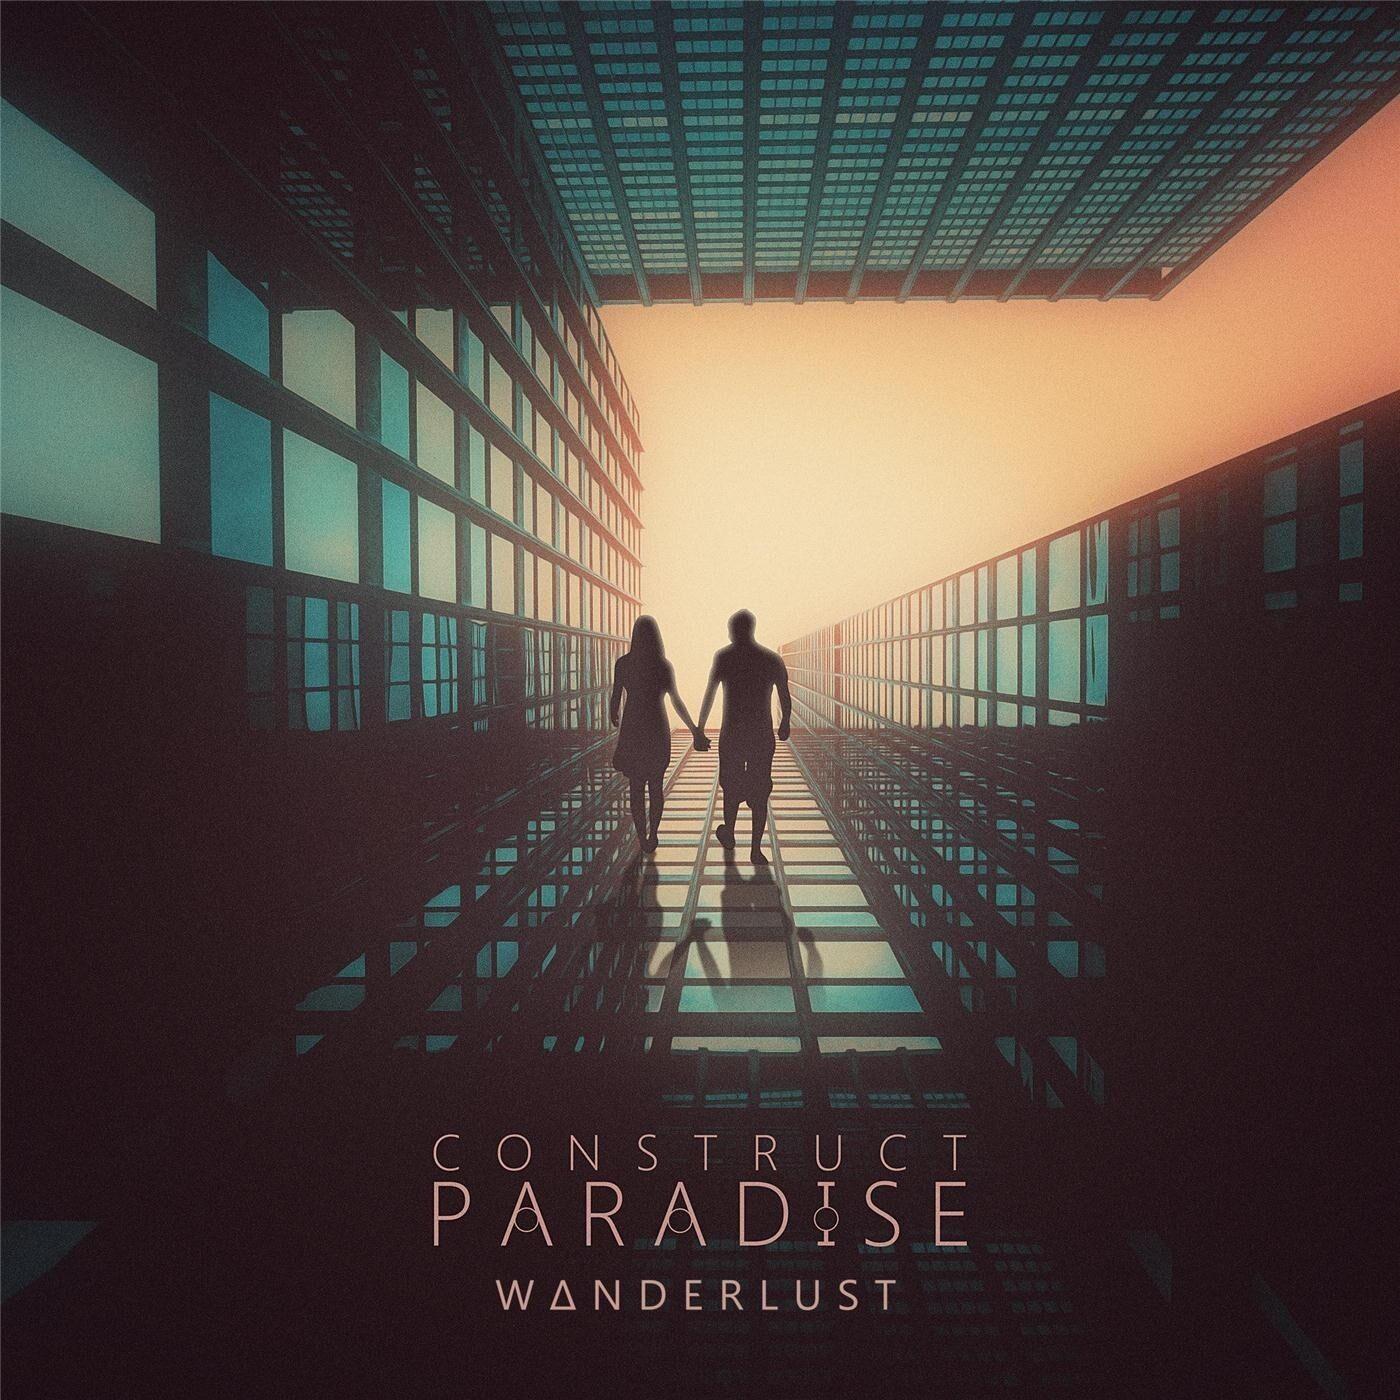 Construct Paradise - Wanderlust [single] (2017)